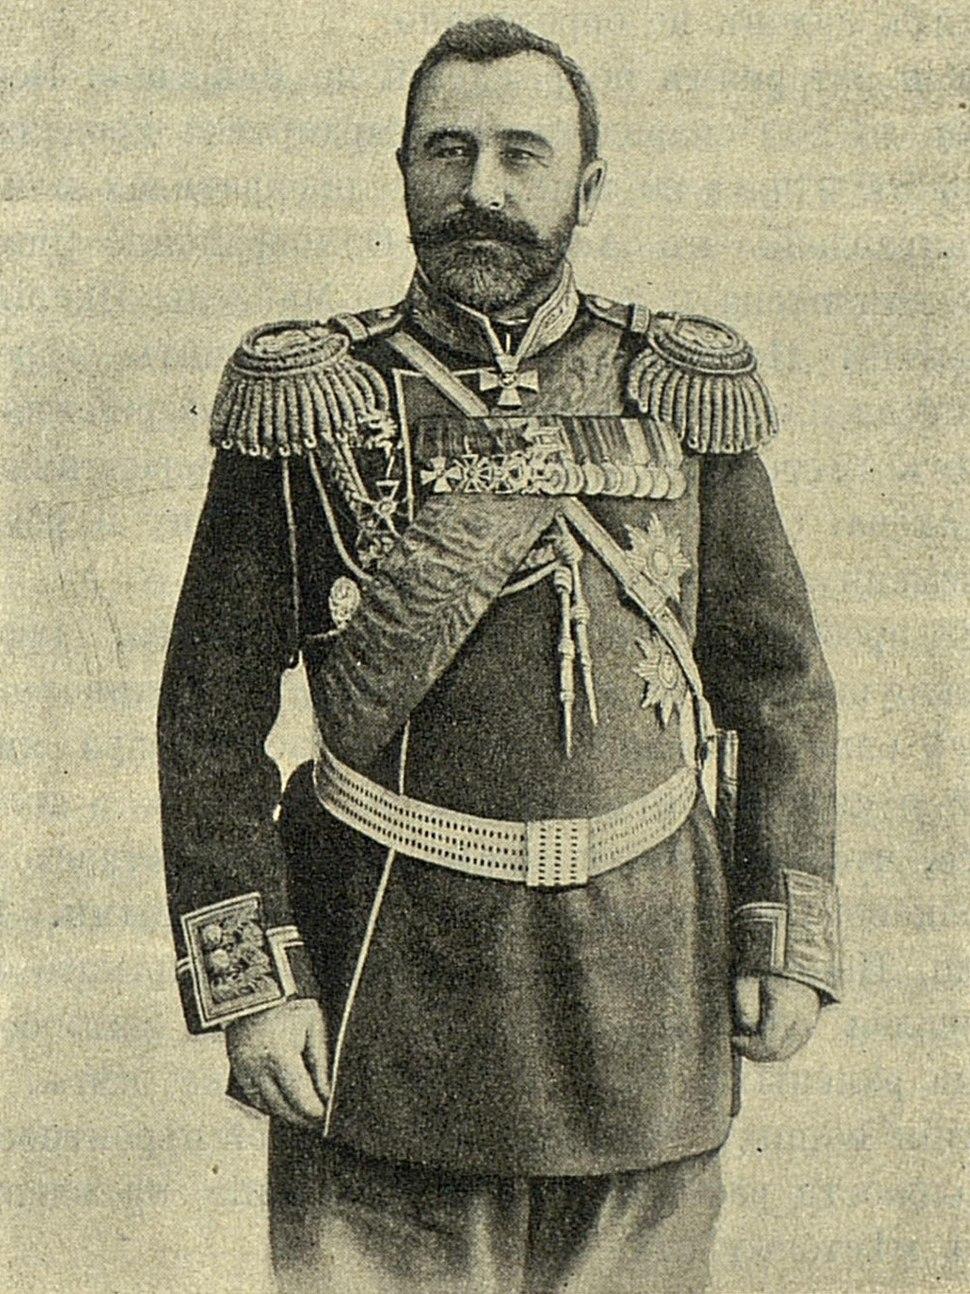 General Kuropatkin